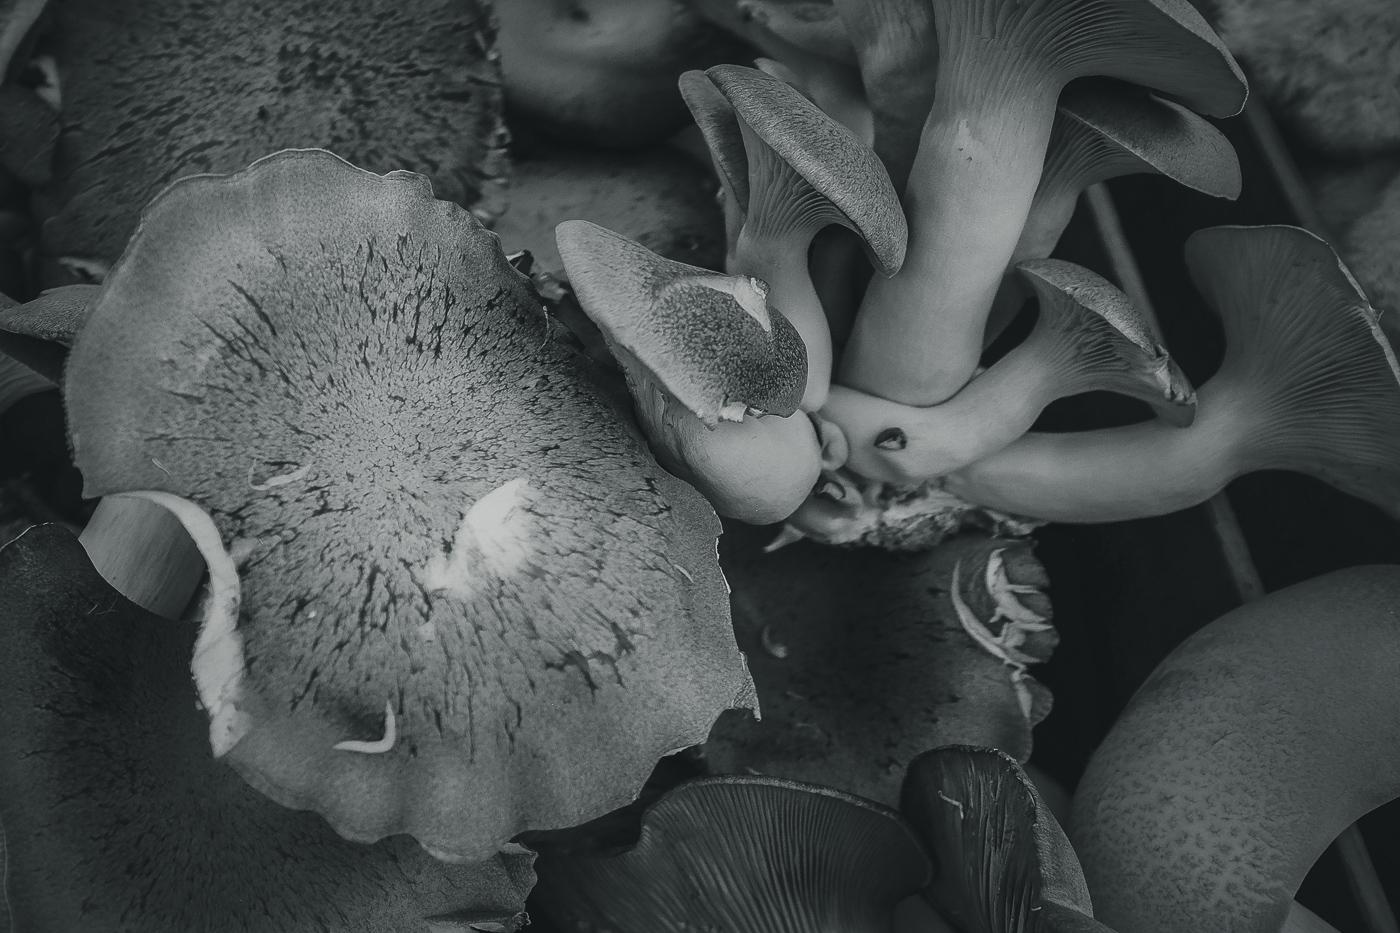 hedy bach images - mushroom - 5